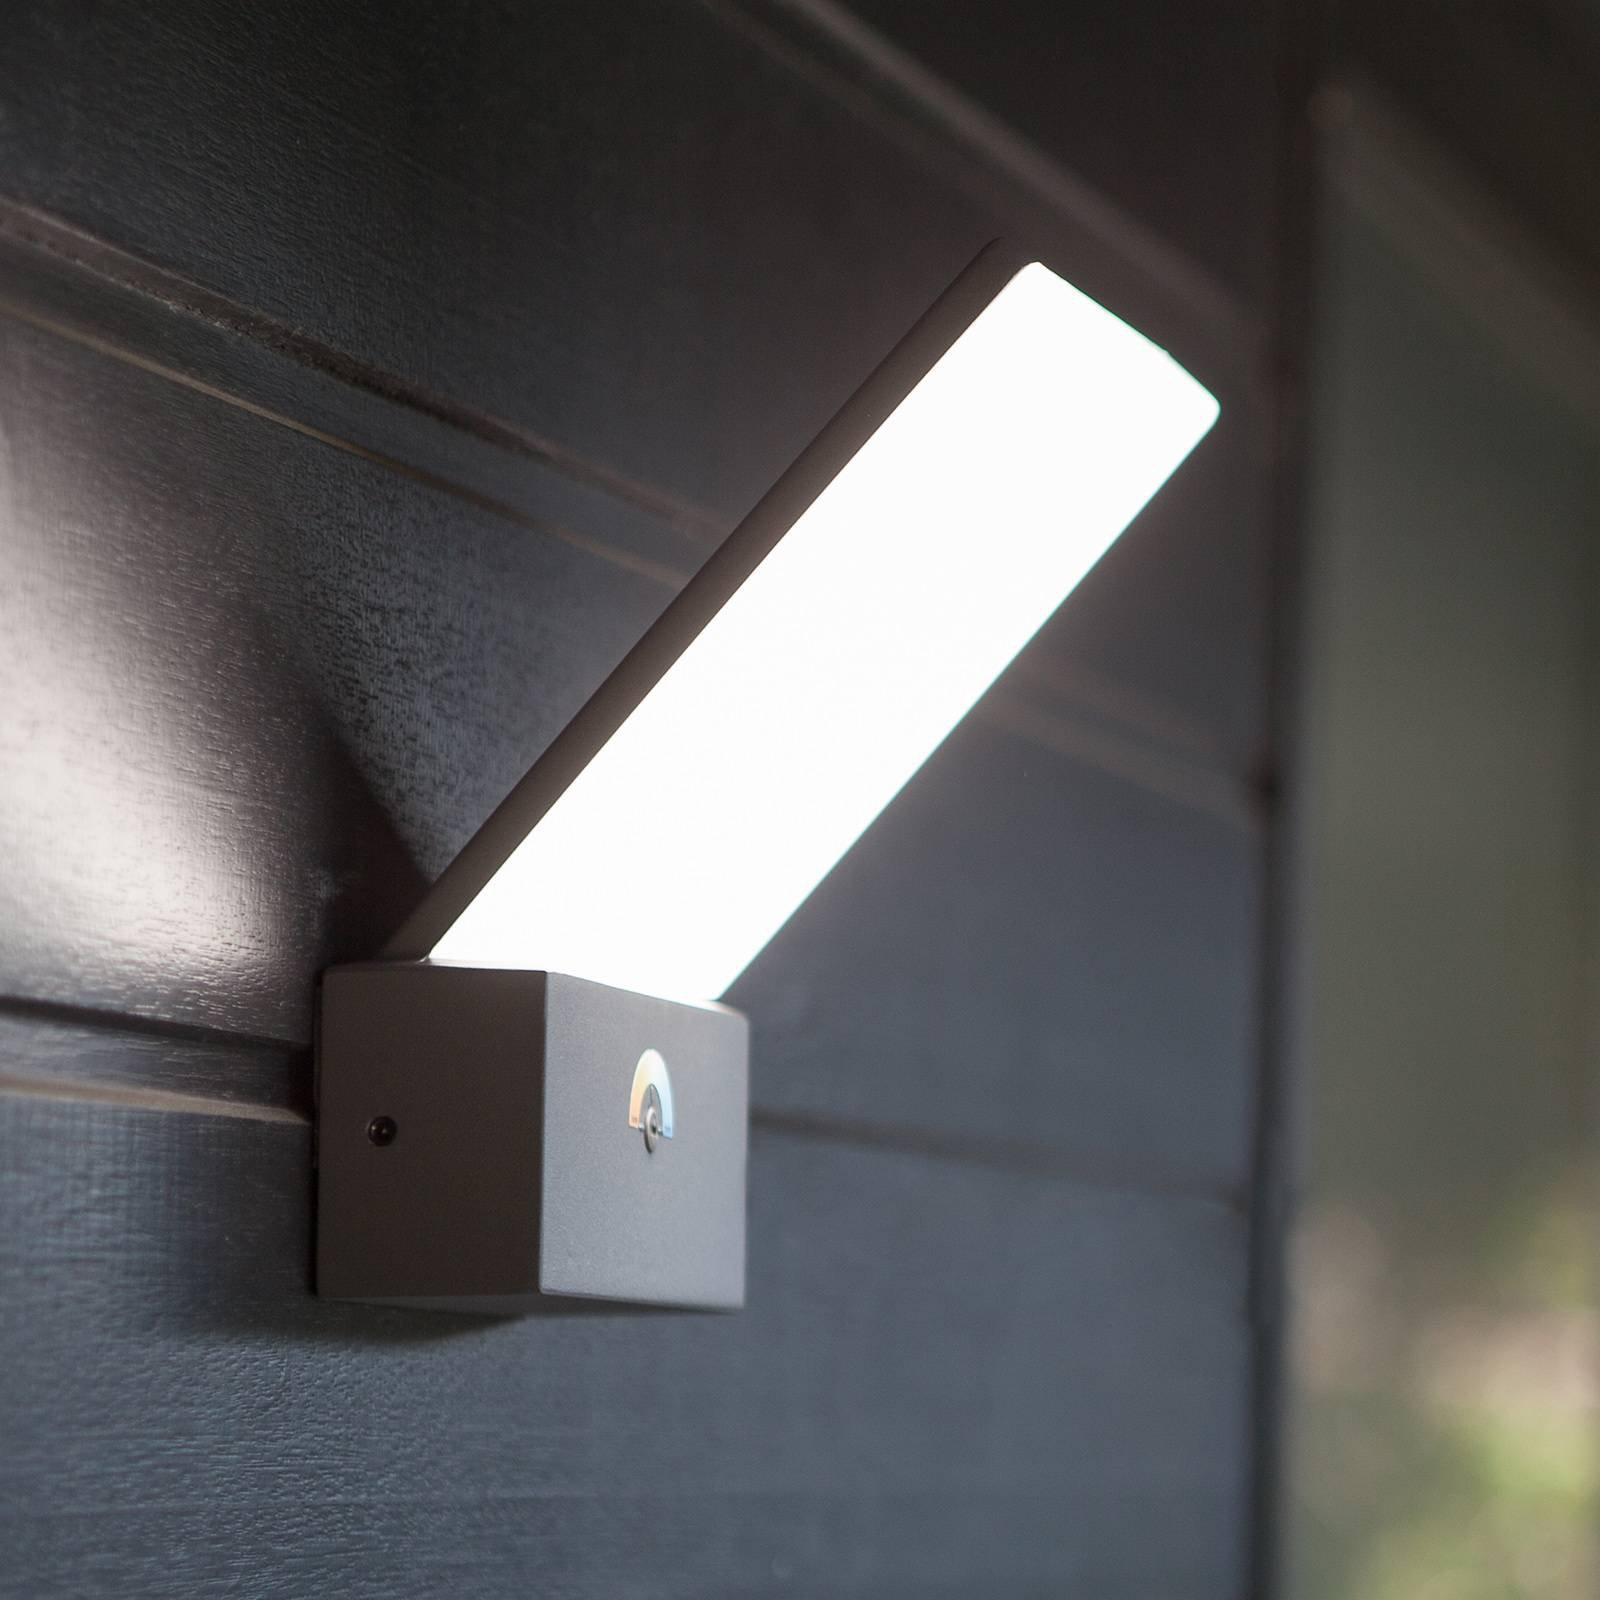 LED-vegglampe Pano, 3 000 K – 5 000 K